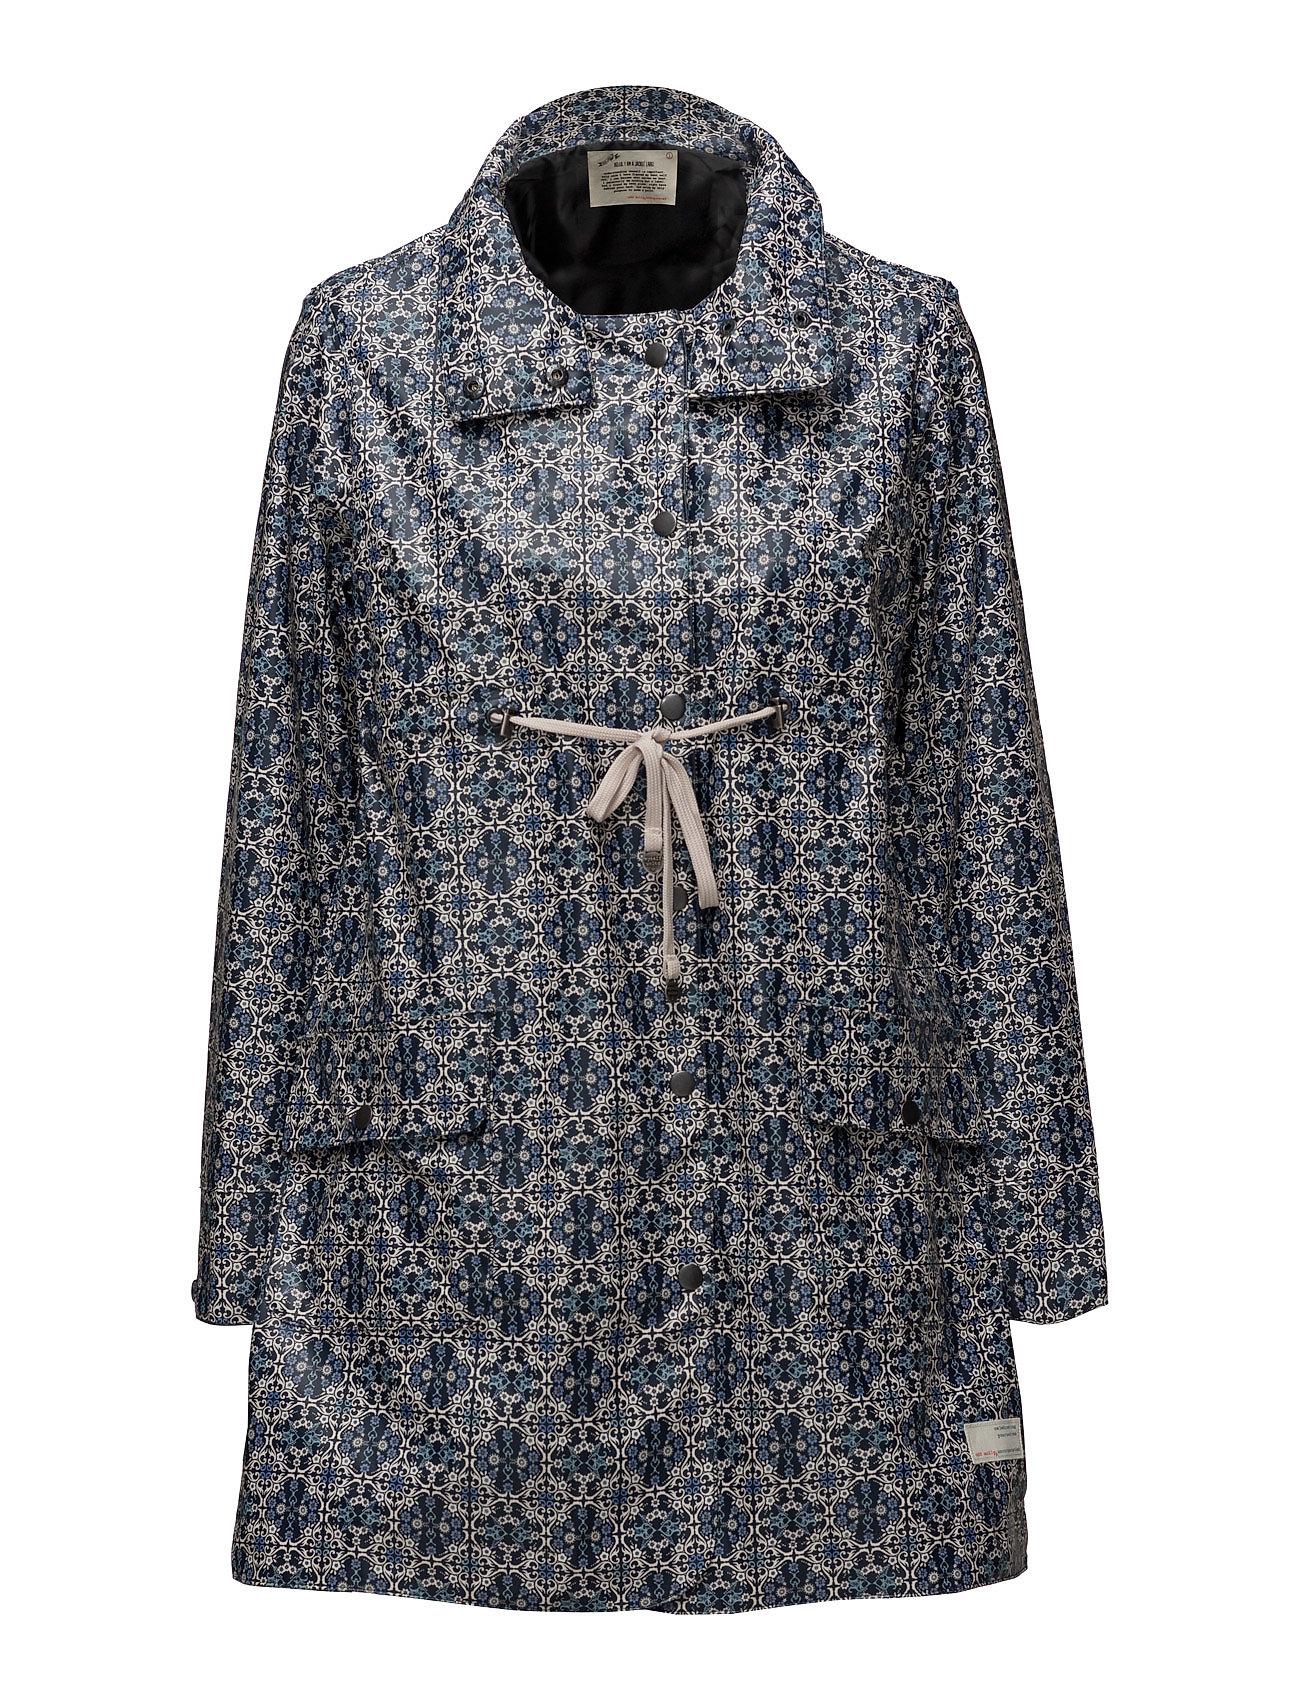 Raindance Rainjacket ODD MOLLY Regntøj til Kvinder i Mørkeblå